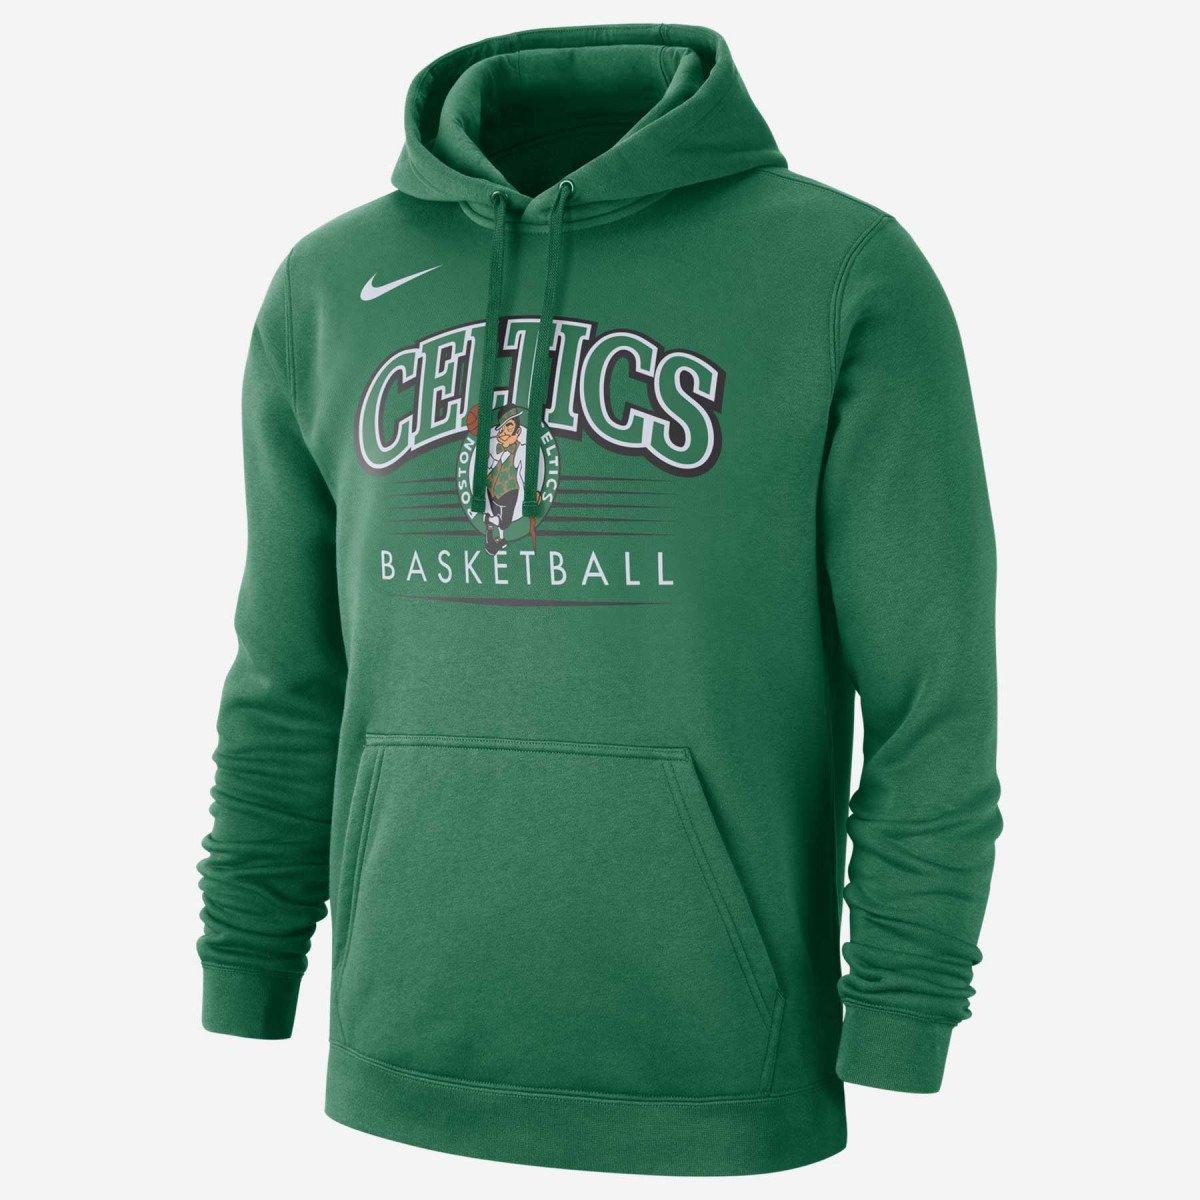 eb4216edc81bce Boston Celtics Nike Men s NBA Hoodie - BV0911-352